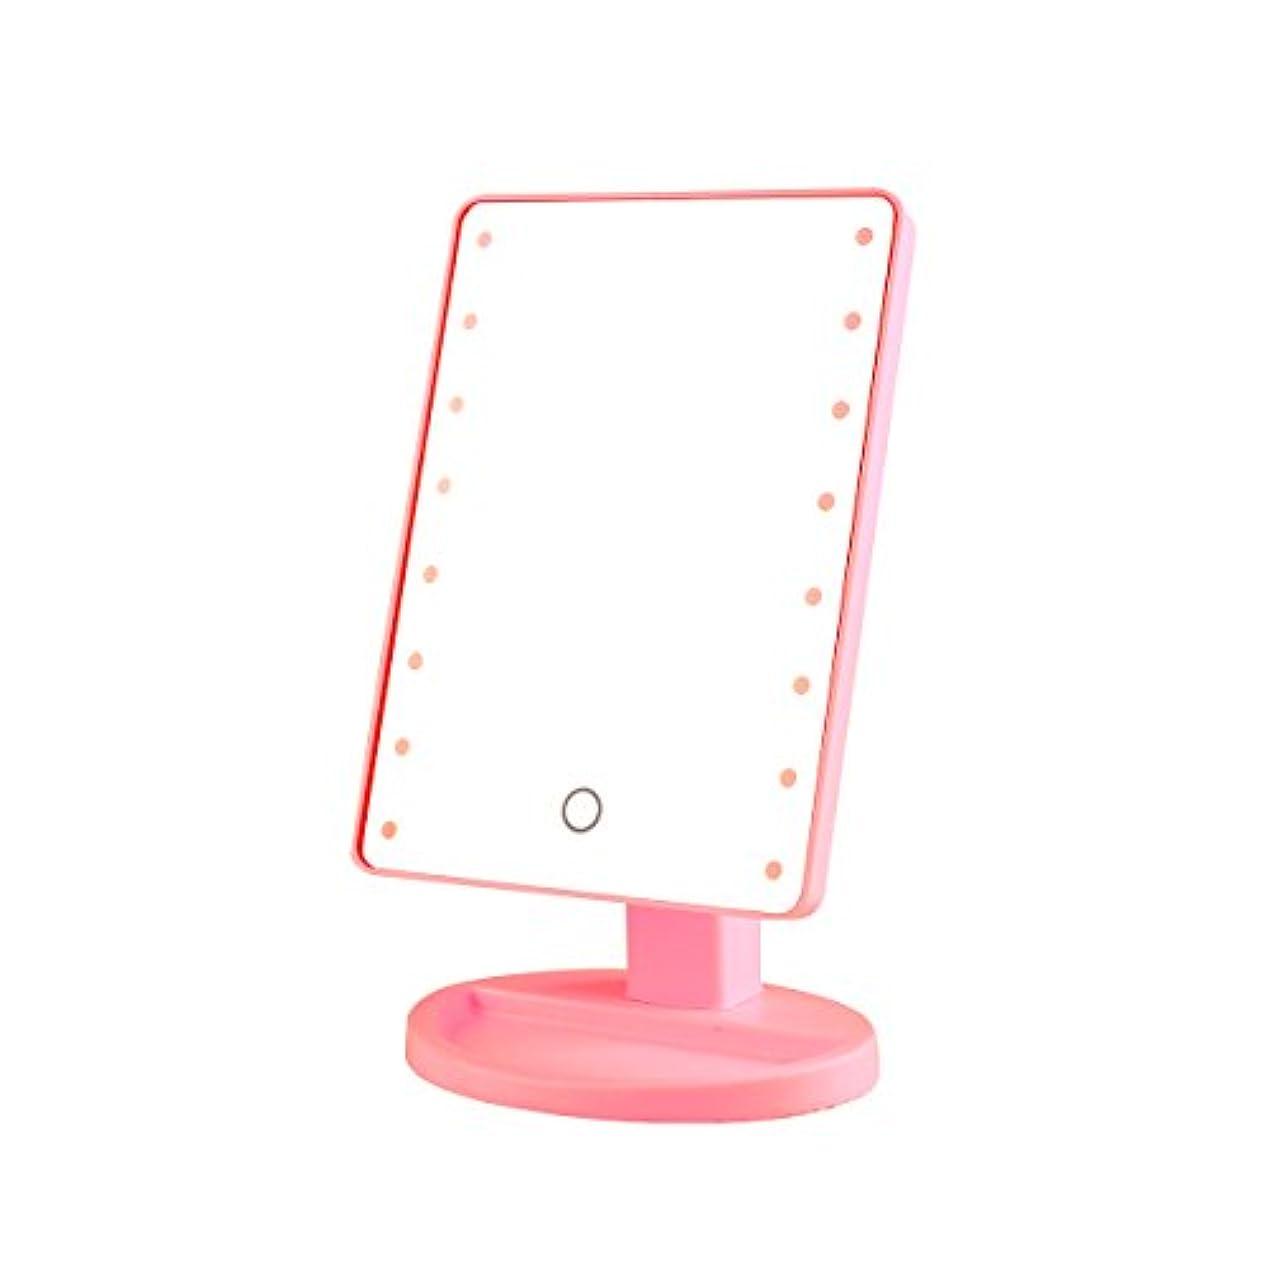 B-PING 鏡 卓上 化粧鏡 16LEDライト搭載 女優ミラー 卓上ミラー 180度回転 電池給電 プレゼント メイク 化粧道具 メイクアップミラー